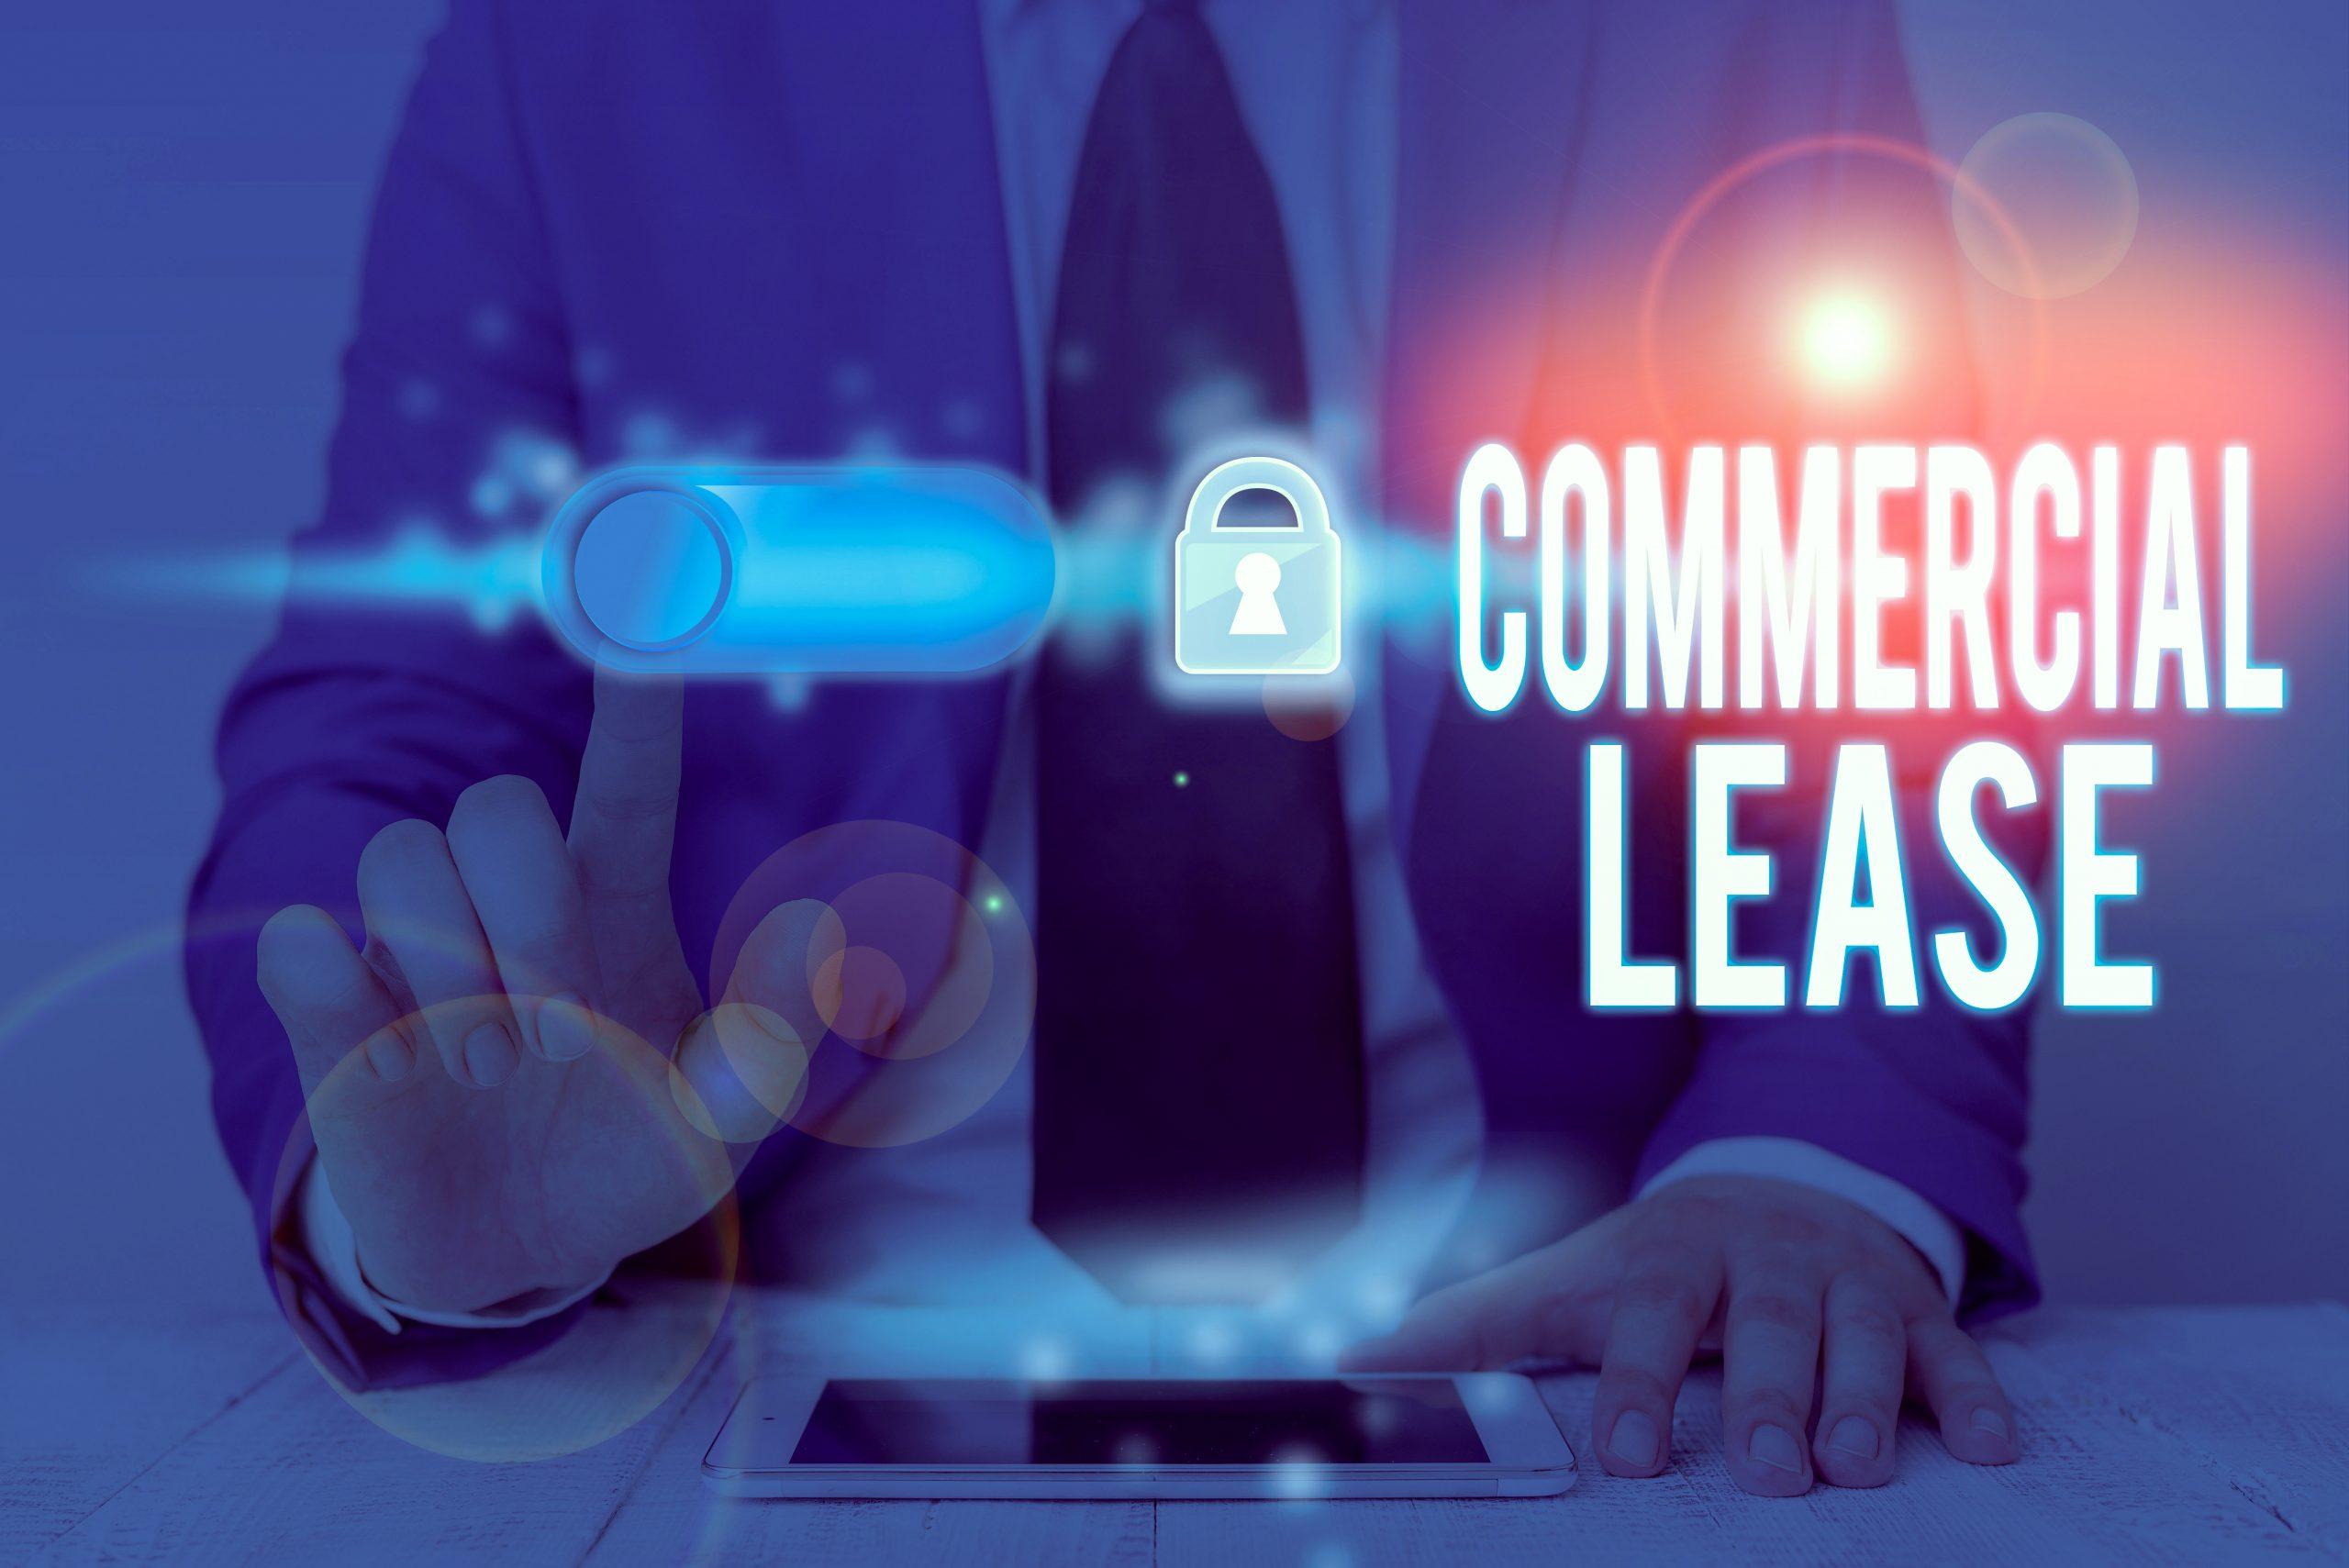 Protection for struggling business tenants until end of September